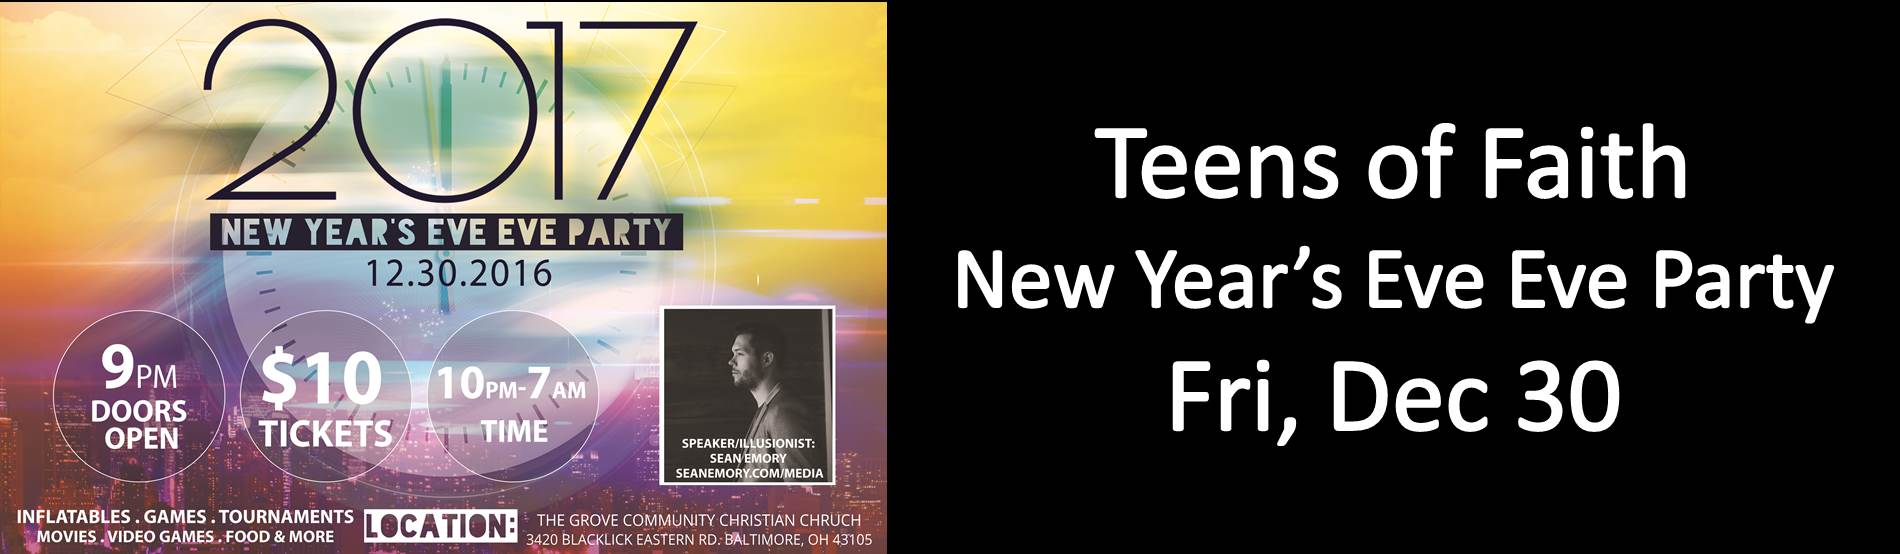 teens-new-years-eve-eve